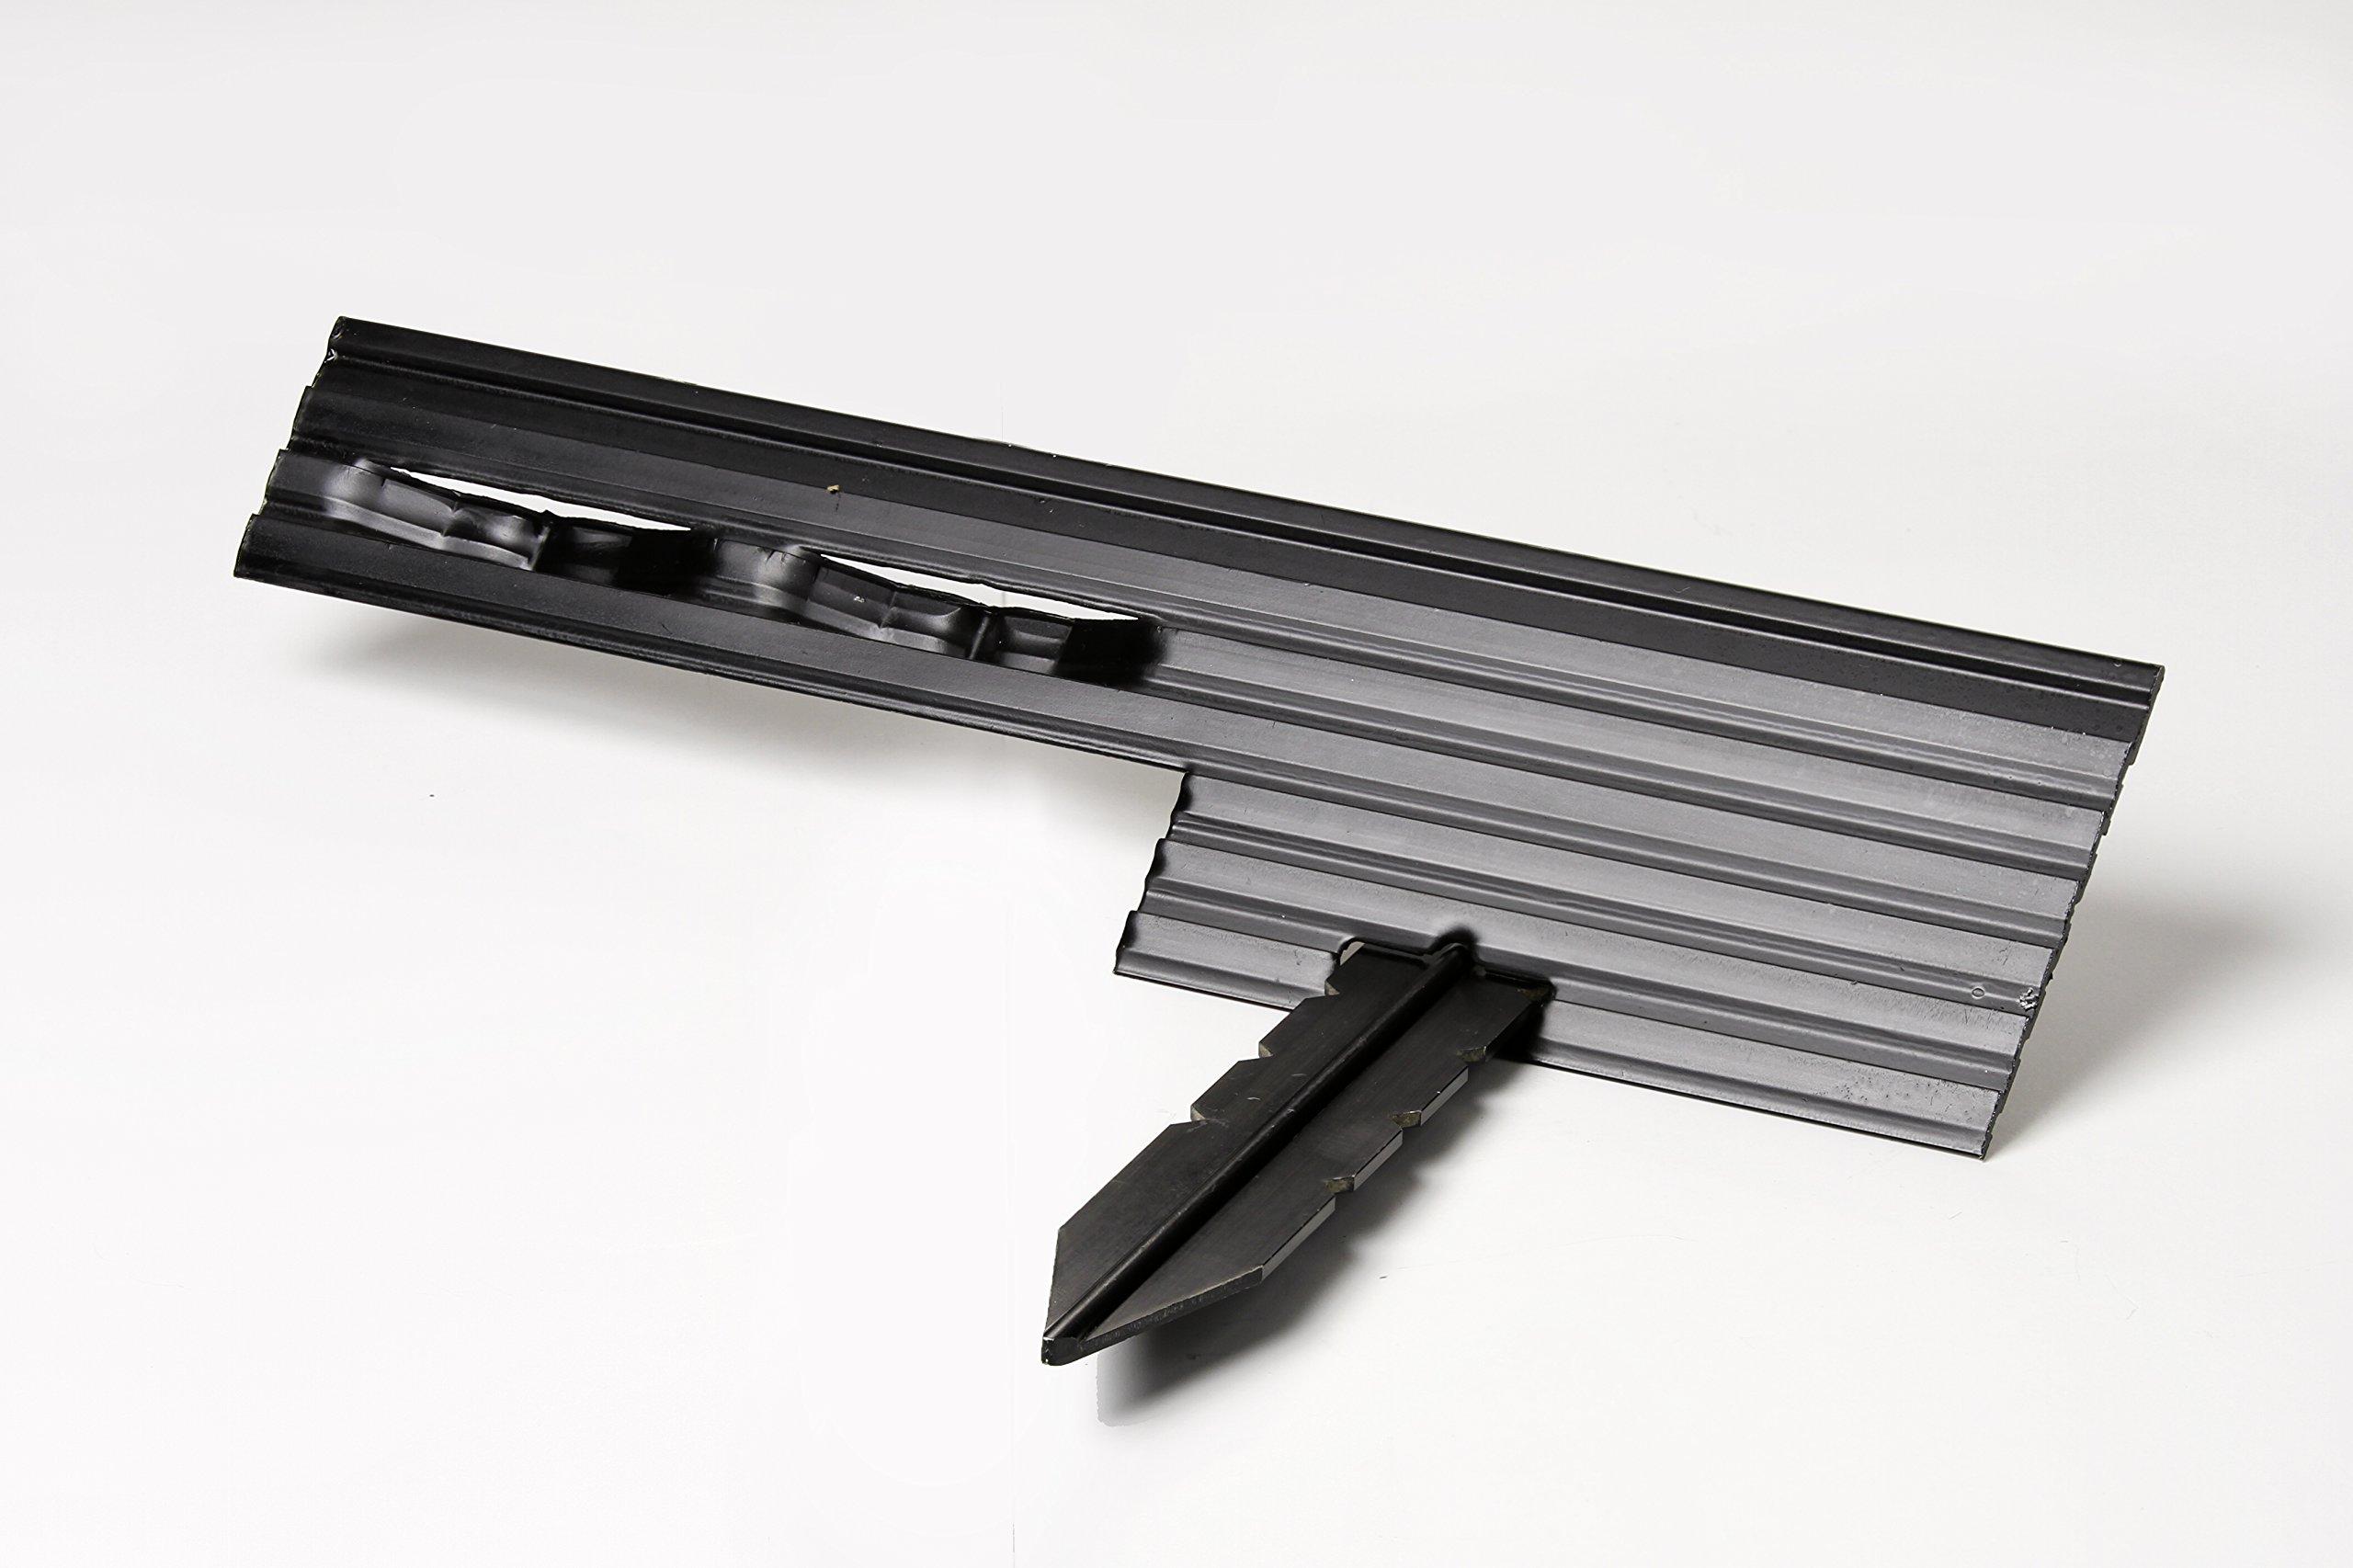 PRO Aluminum Landscape Edging - 1/8'' X 4'' X 8' (120' per box) - Mill Finish by Sure-Loc (Image #3)